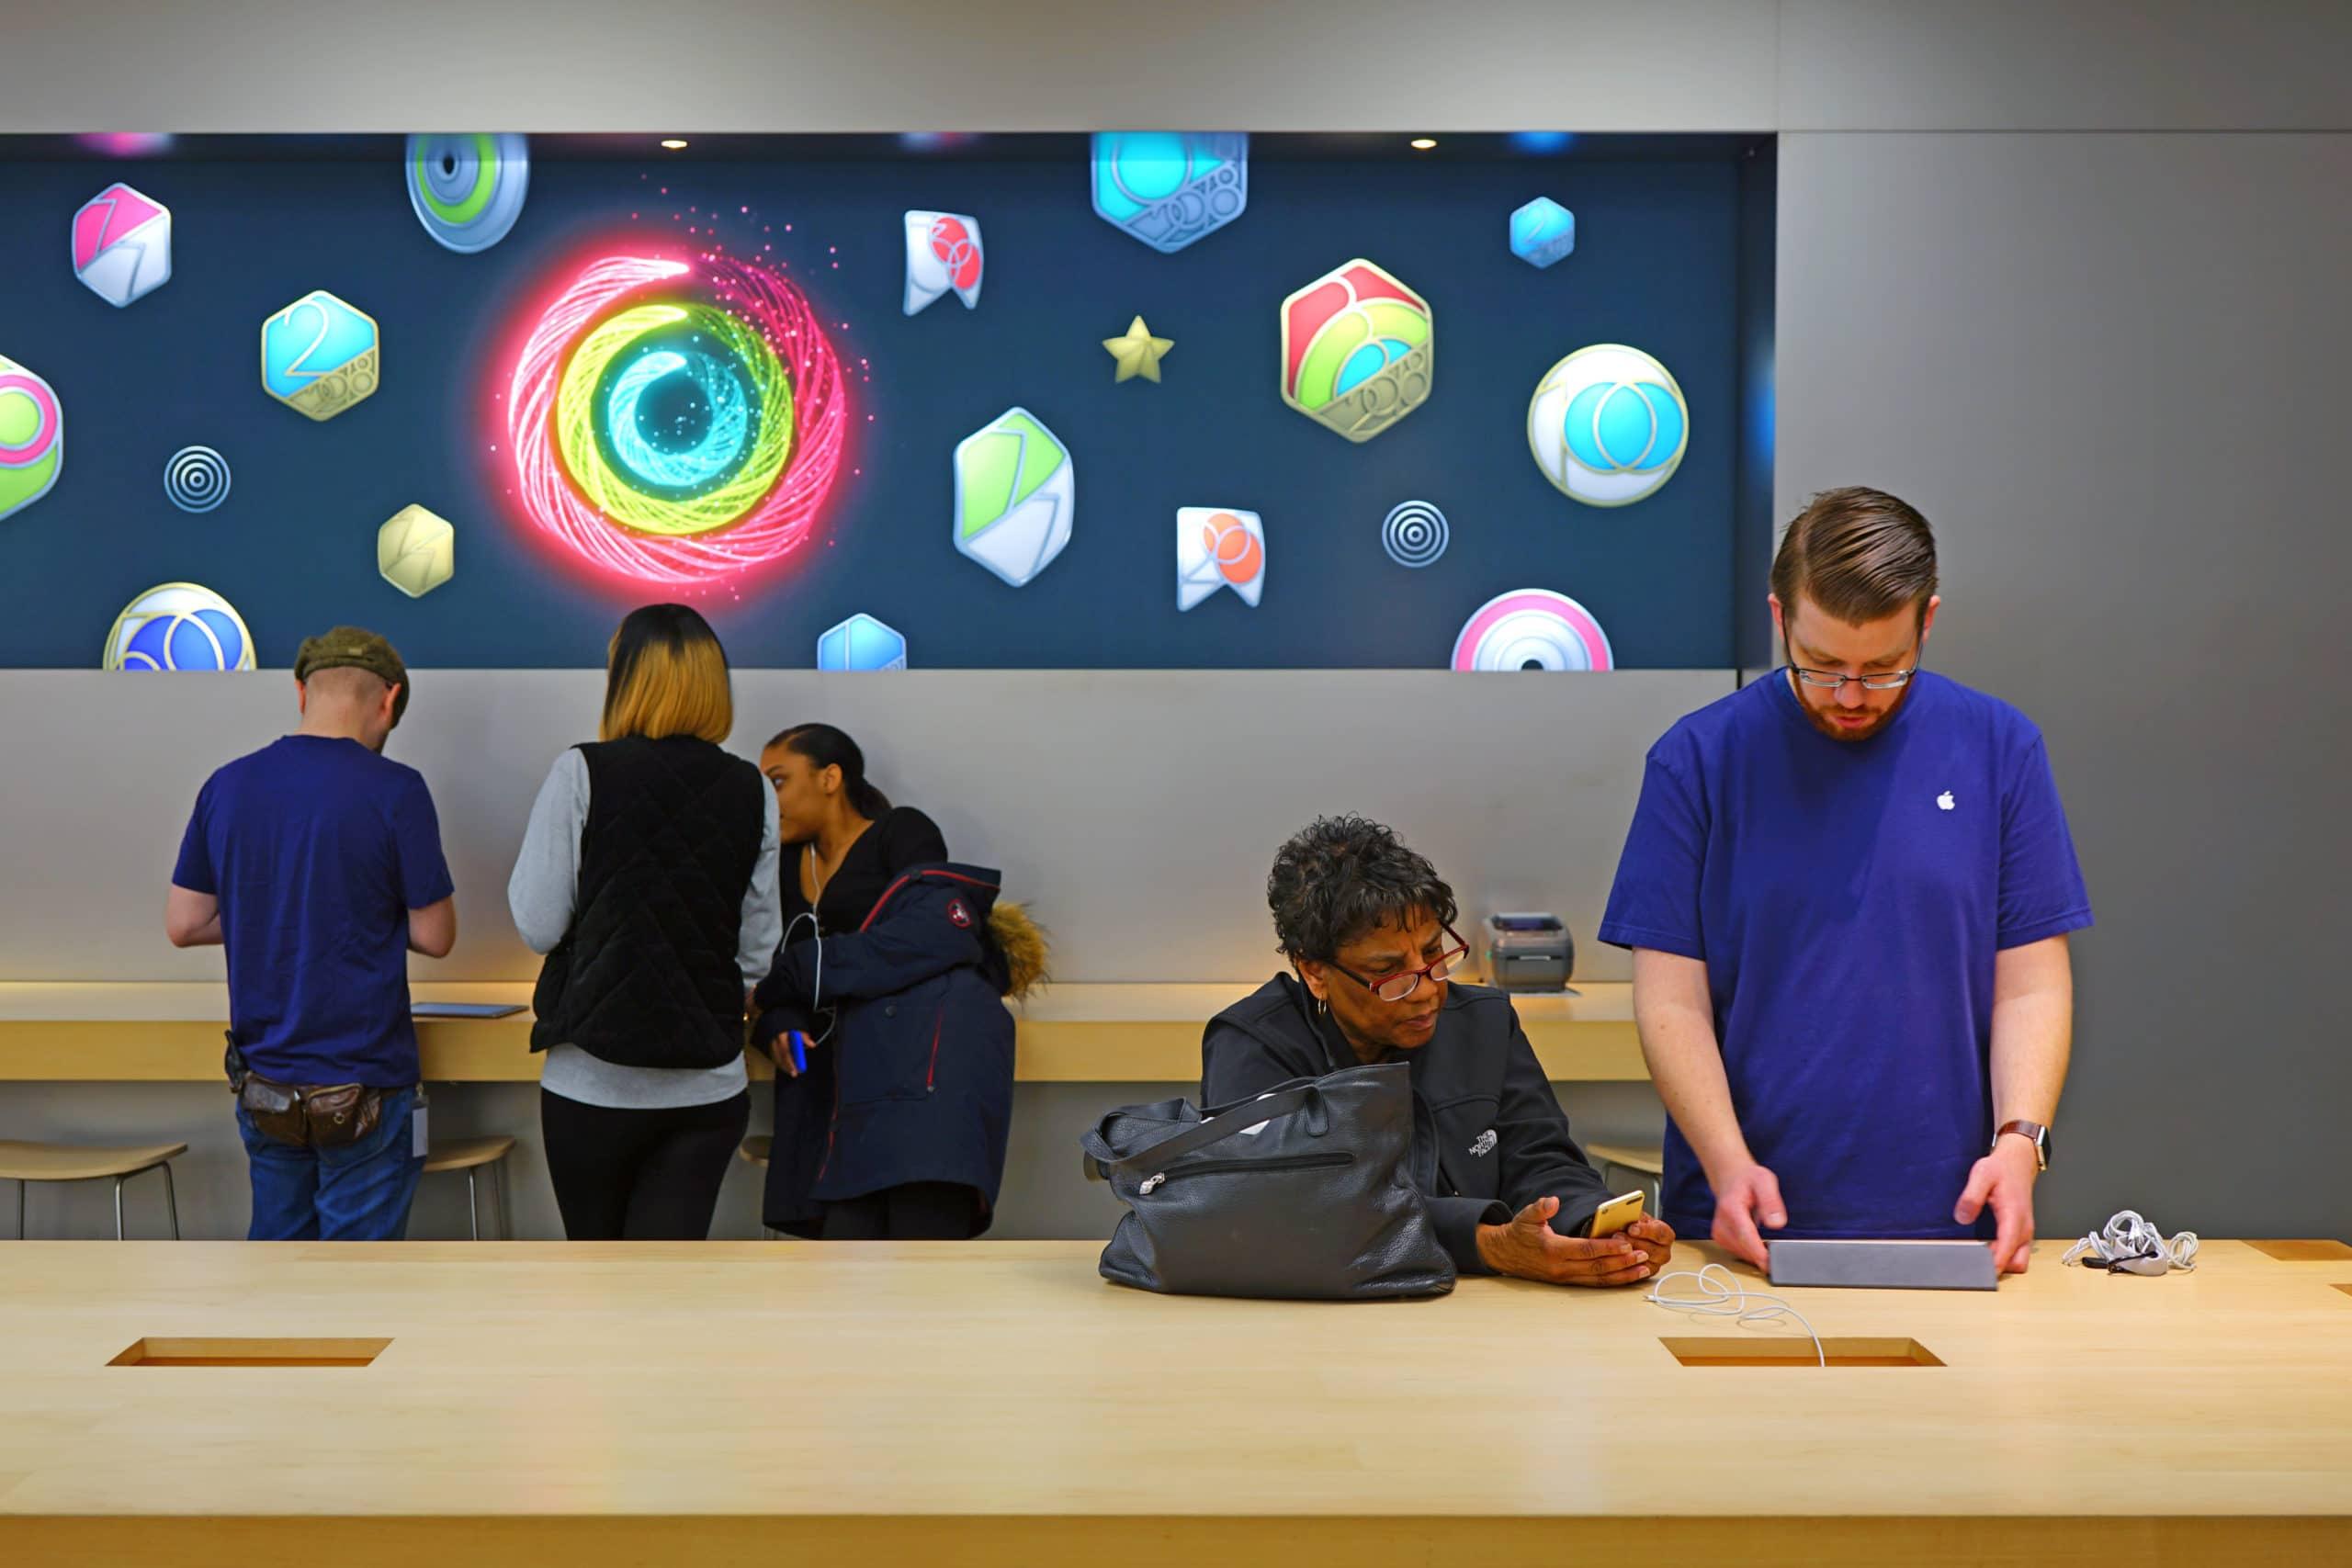 Atendimento em uma loja da Apple